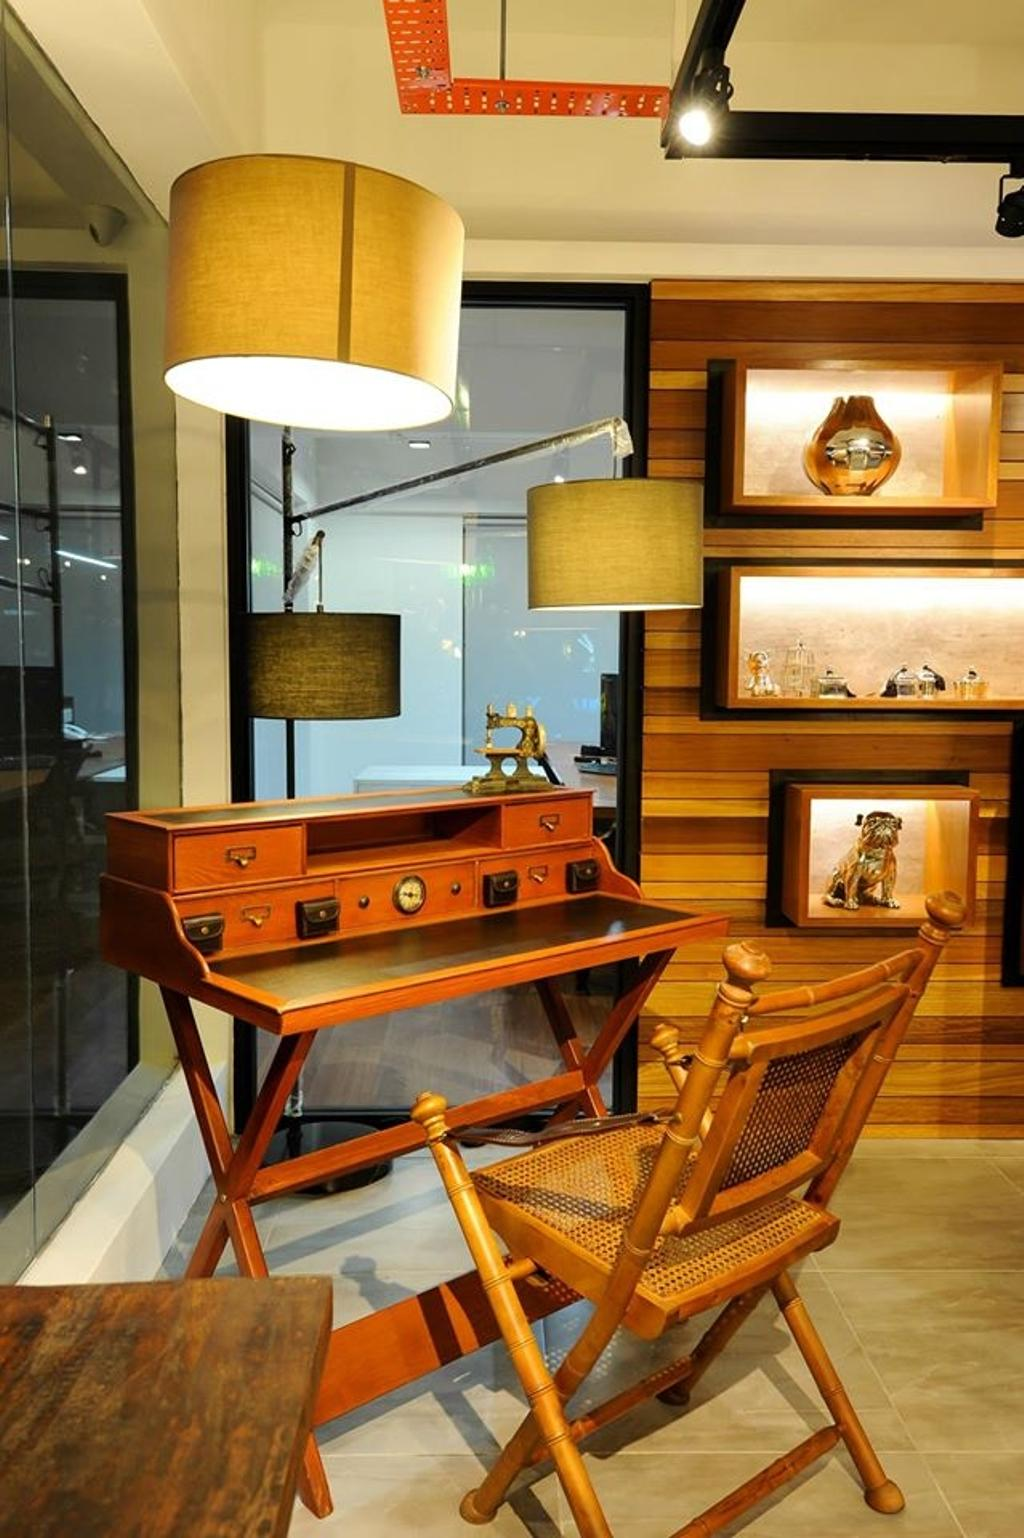 Showroom, Commercial, Interior Designer, M innovative Builders, Lamp, Table Lamp, Chair, Furniture